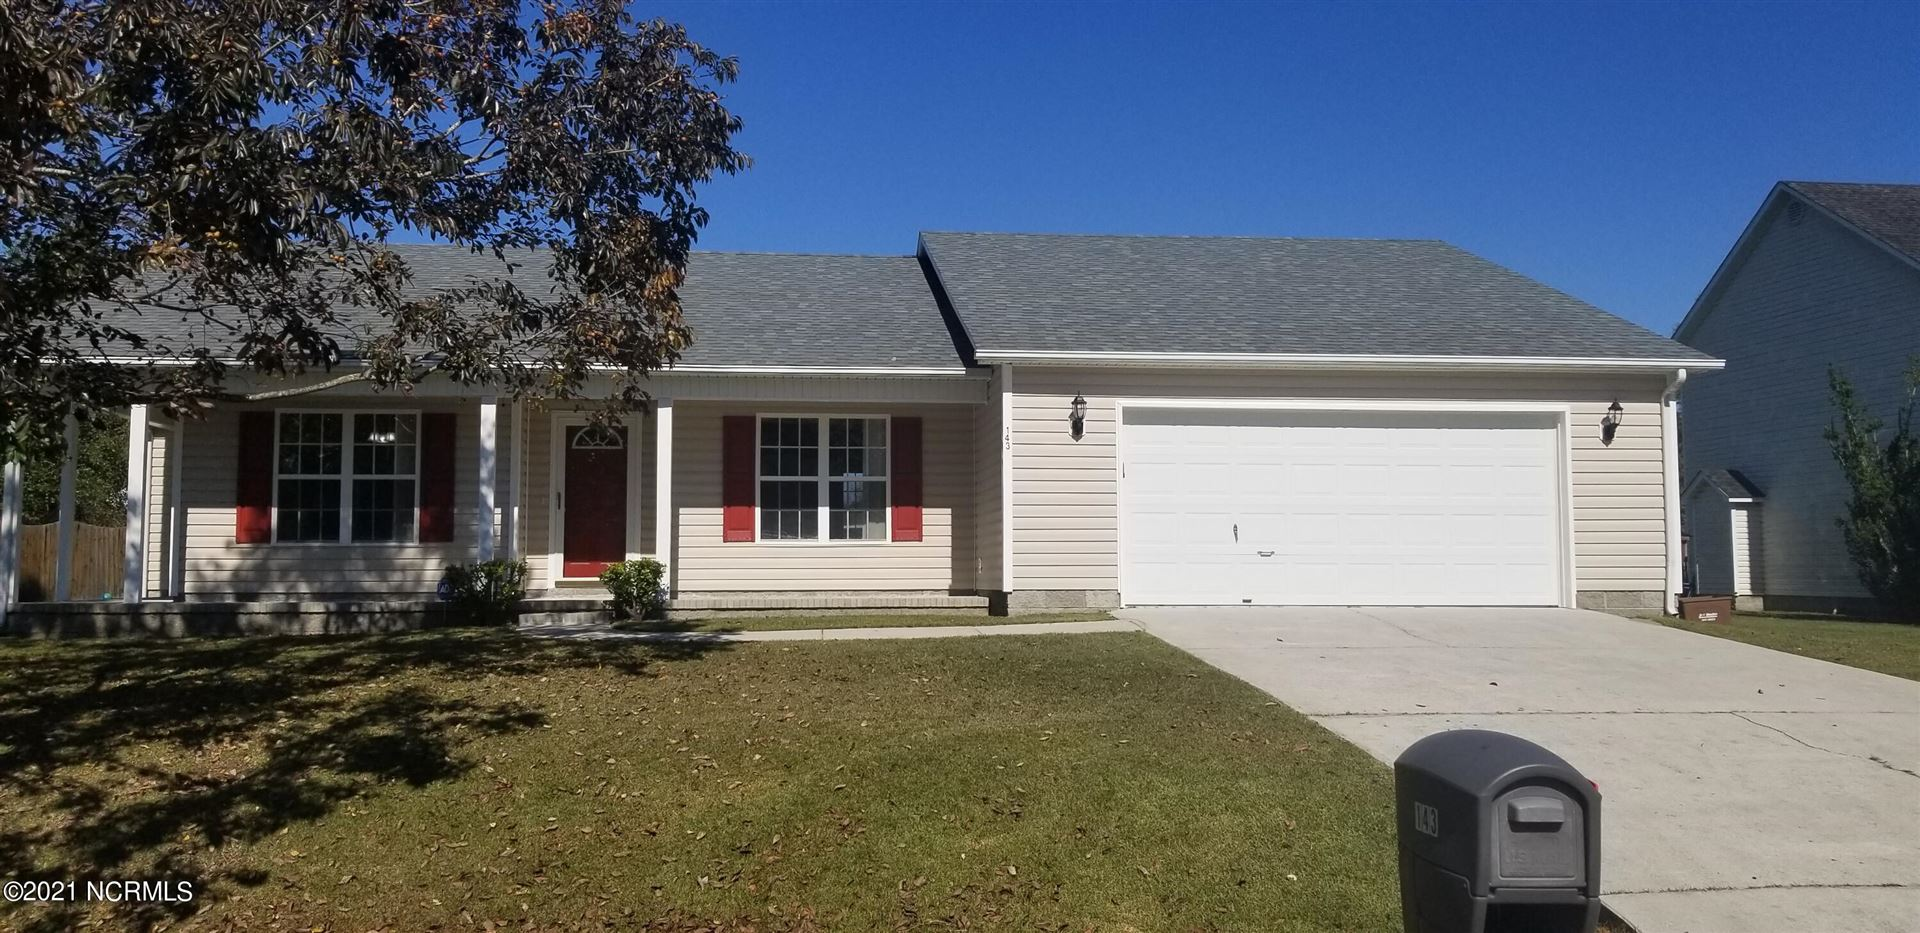 Photo of 143 Plow Point Lane, Jacksonville, NC 28546 (MLS # 100296298)